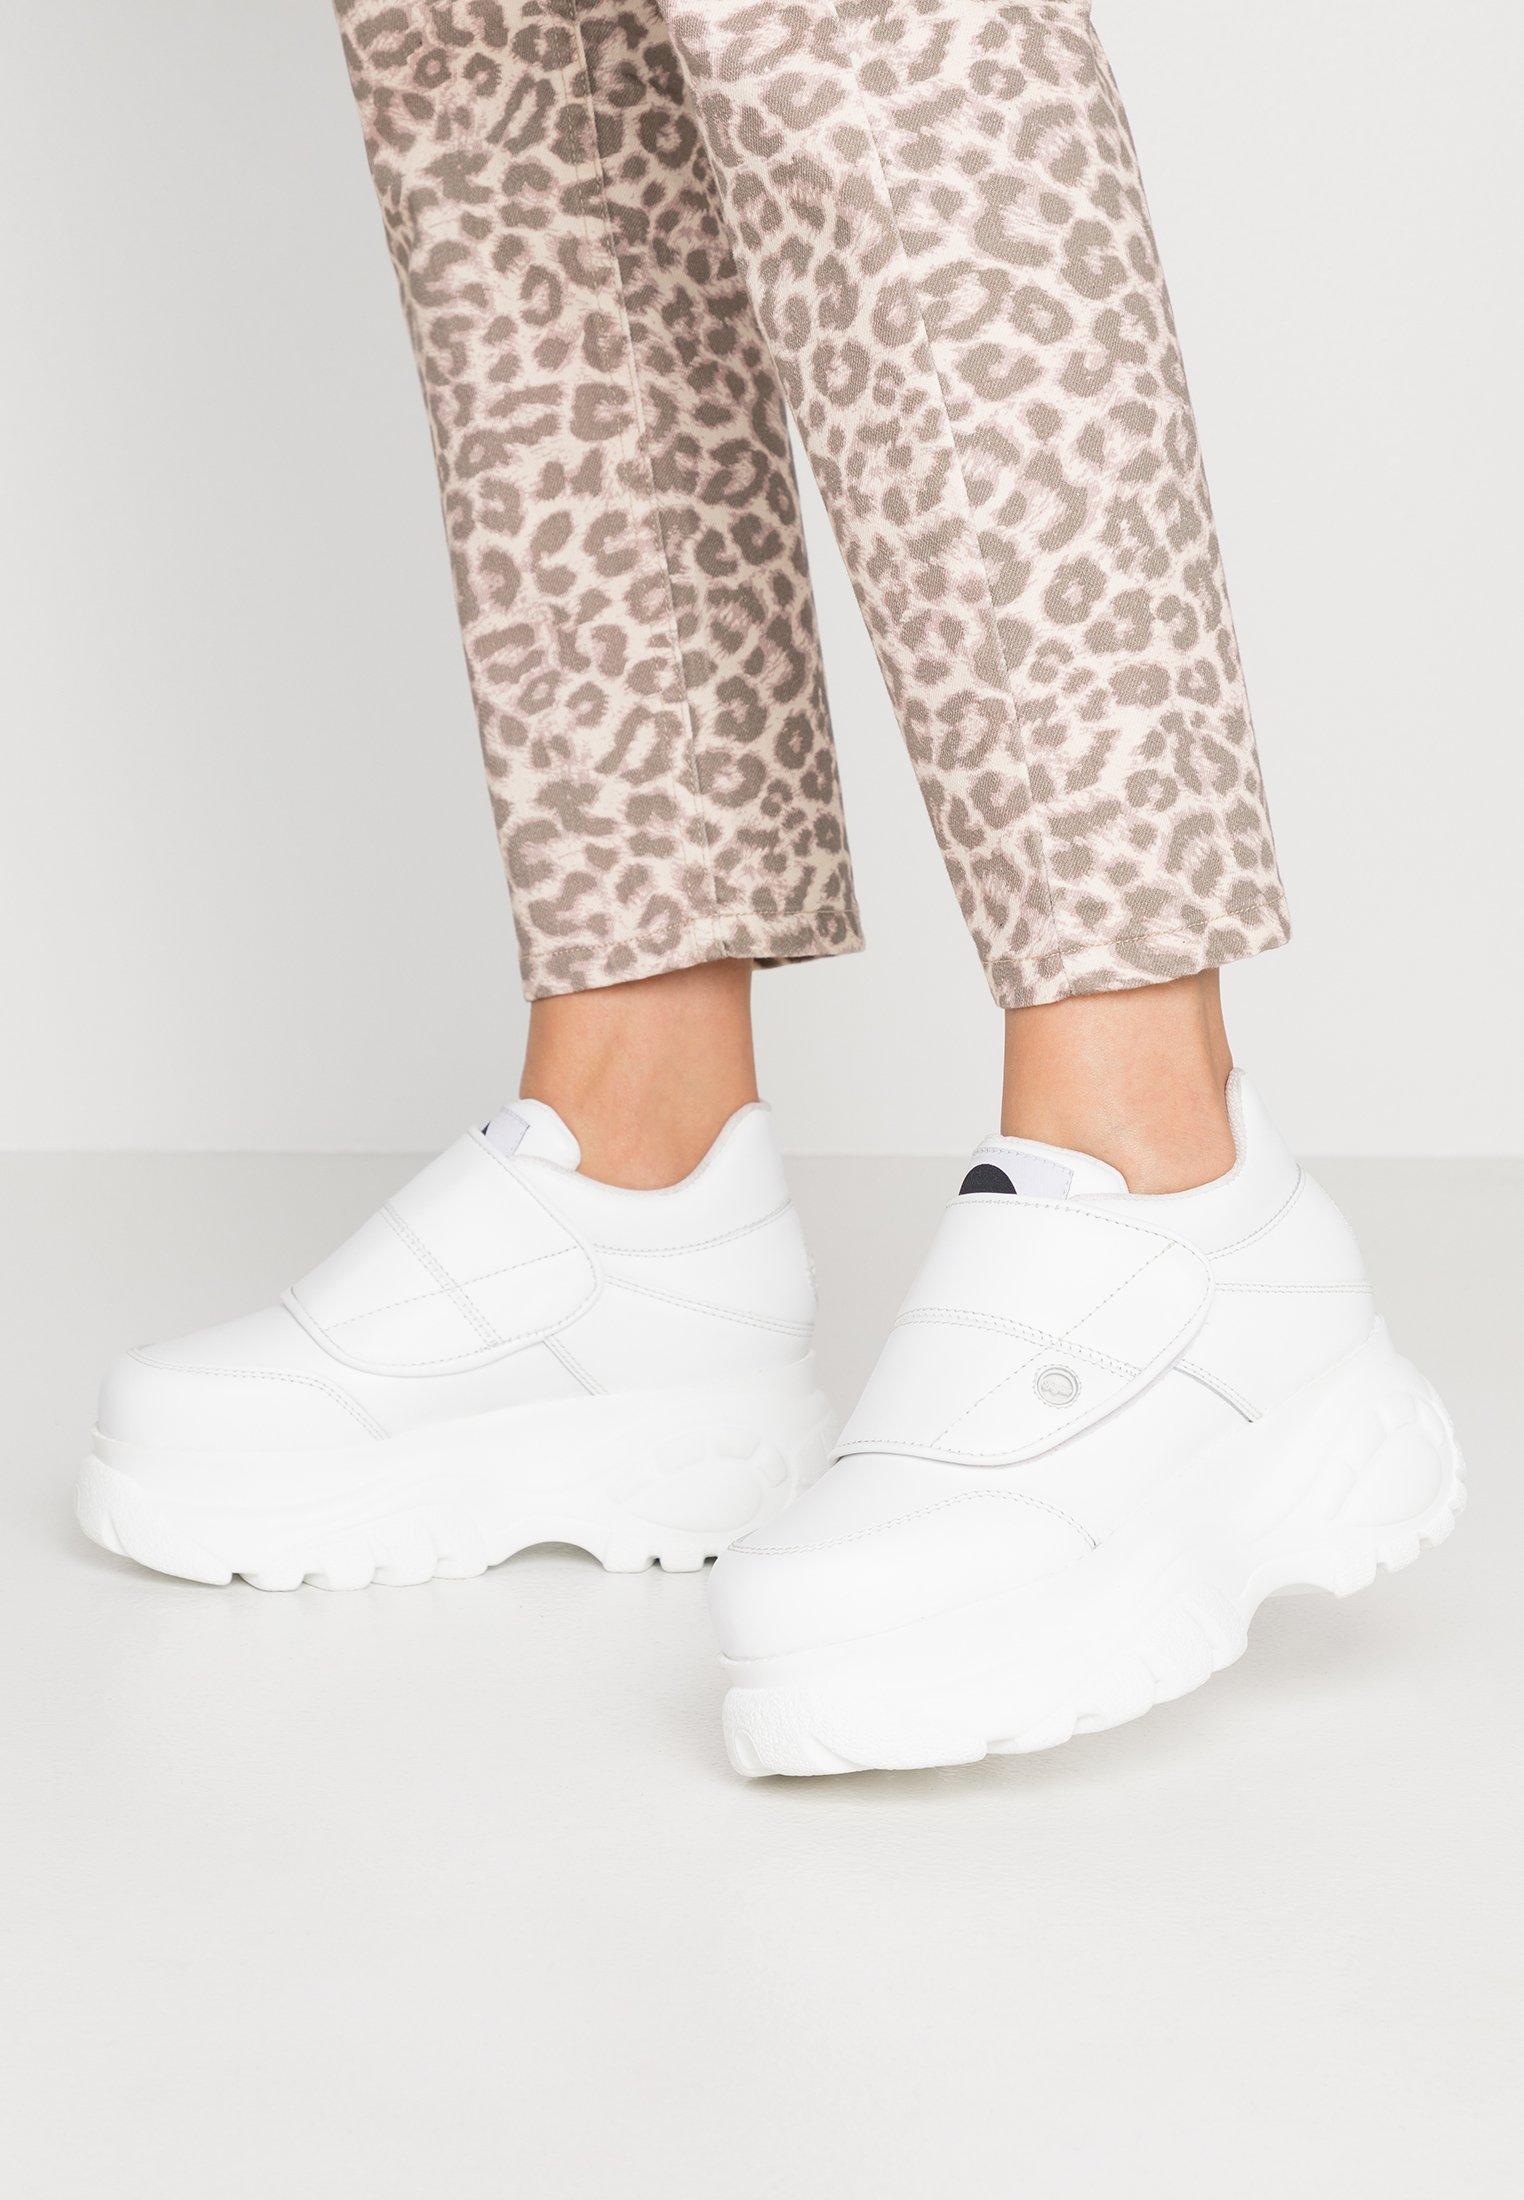 Sneakers Basse Basse London Sneakers London White London White Buffalo Buffalo Buffalo sdrCxthQ